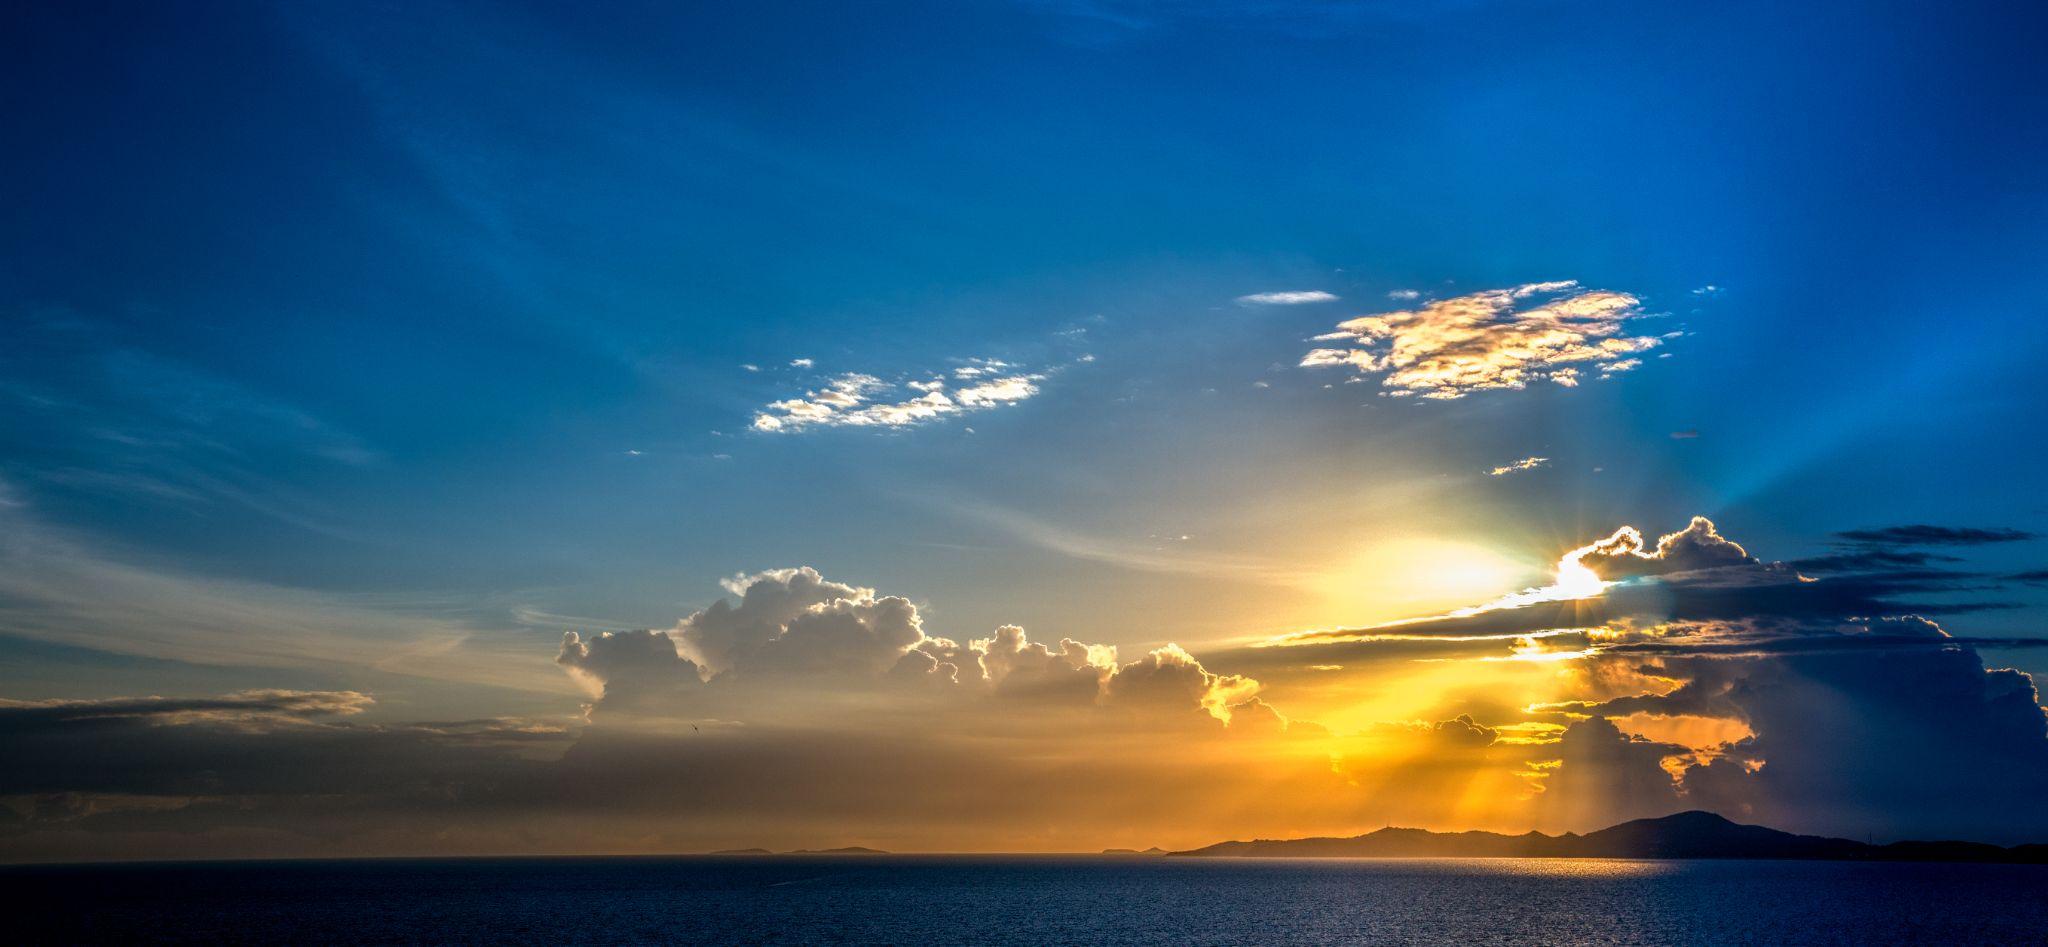 Koh Larn Island  by scott.innes1